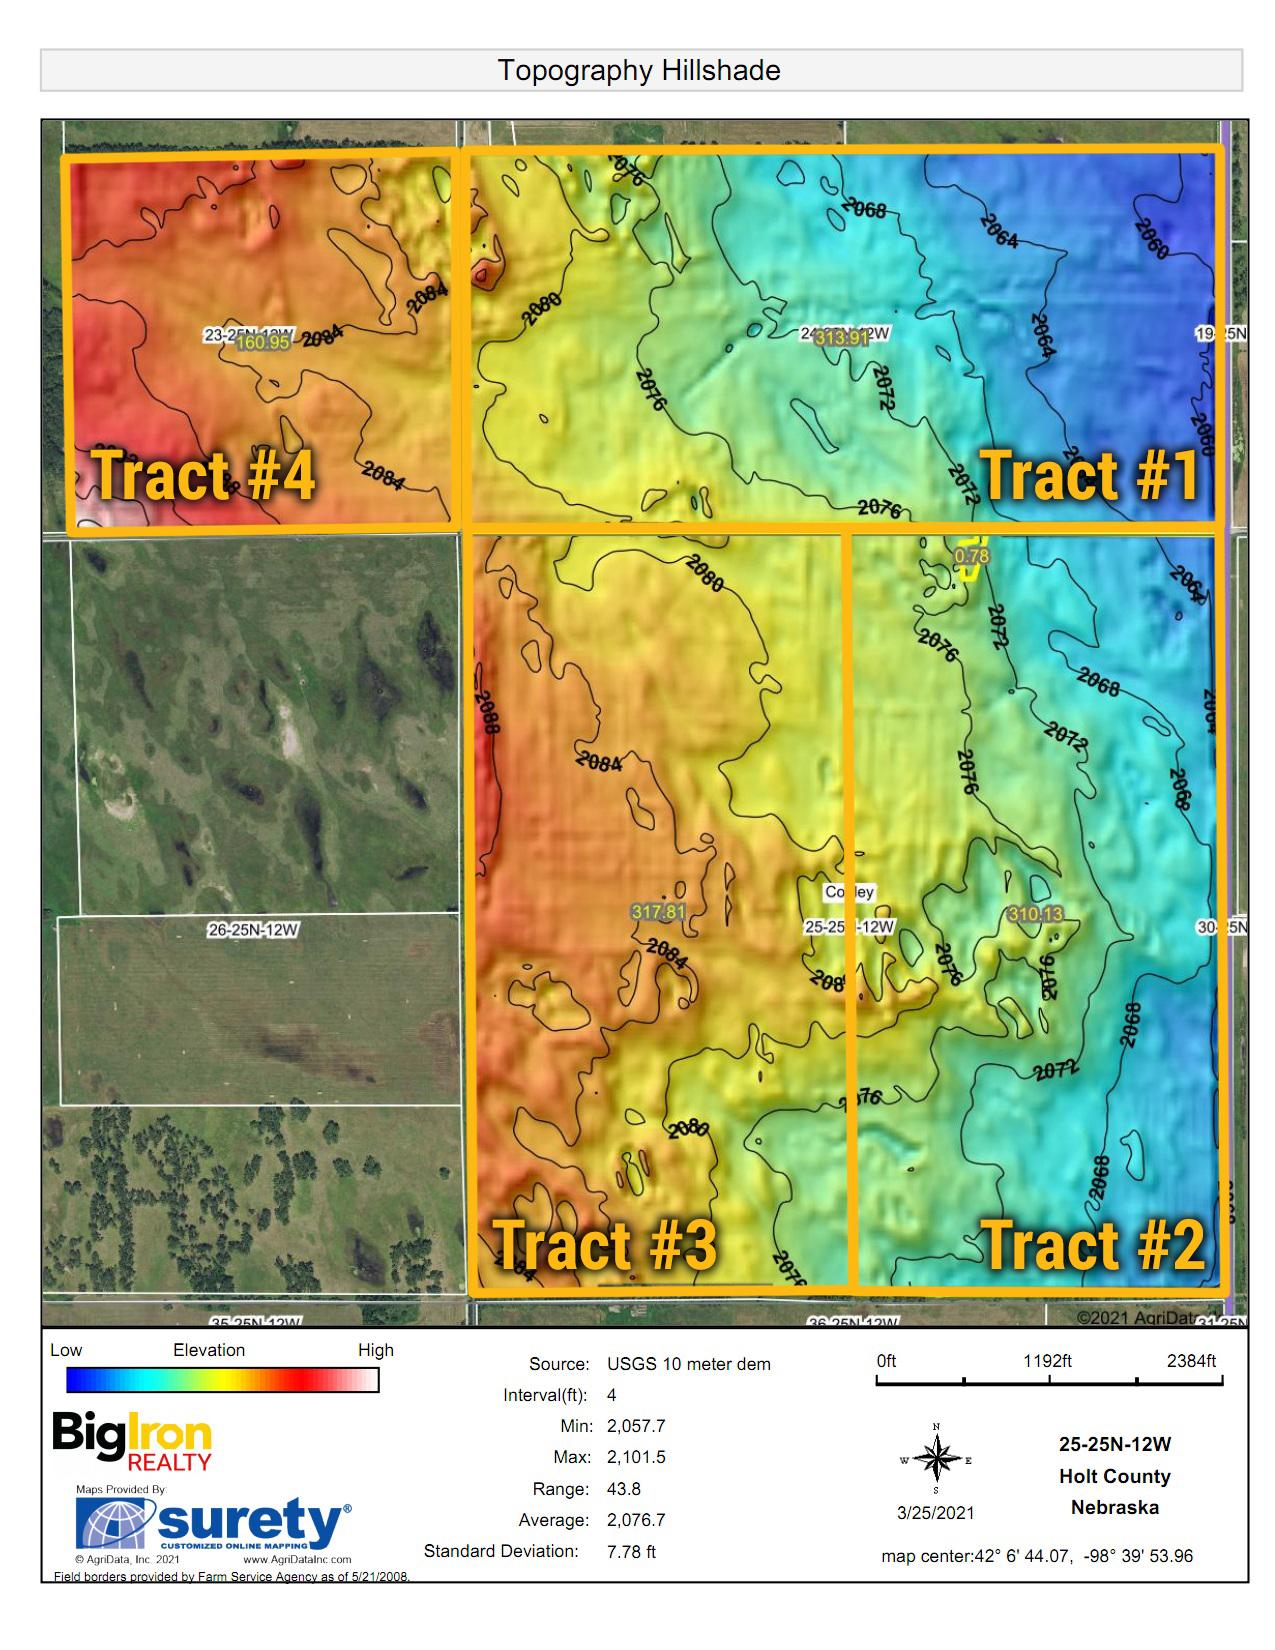 Topography Hillshade_Tr1-4_BIR-2115